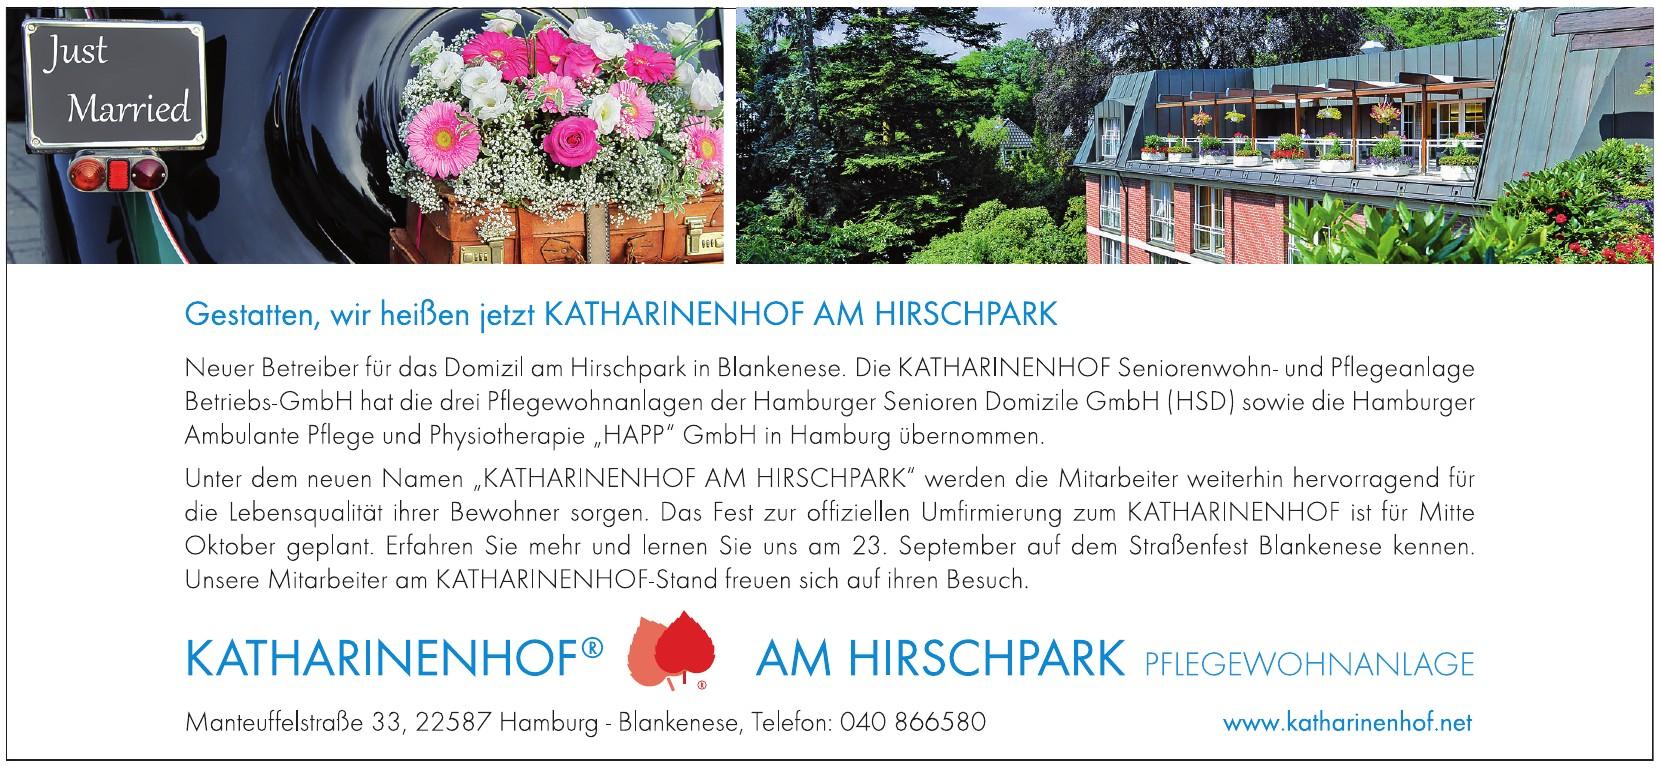 Katharinenhof am Hirschpark